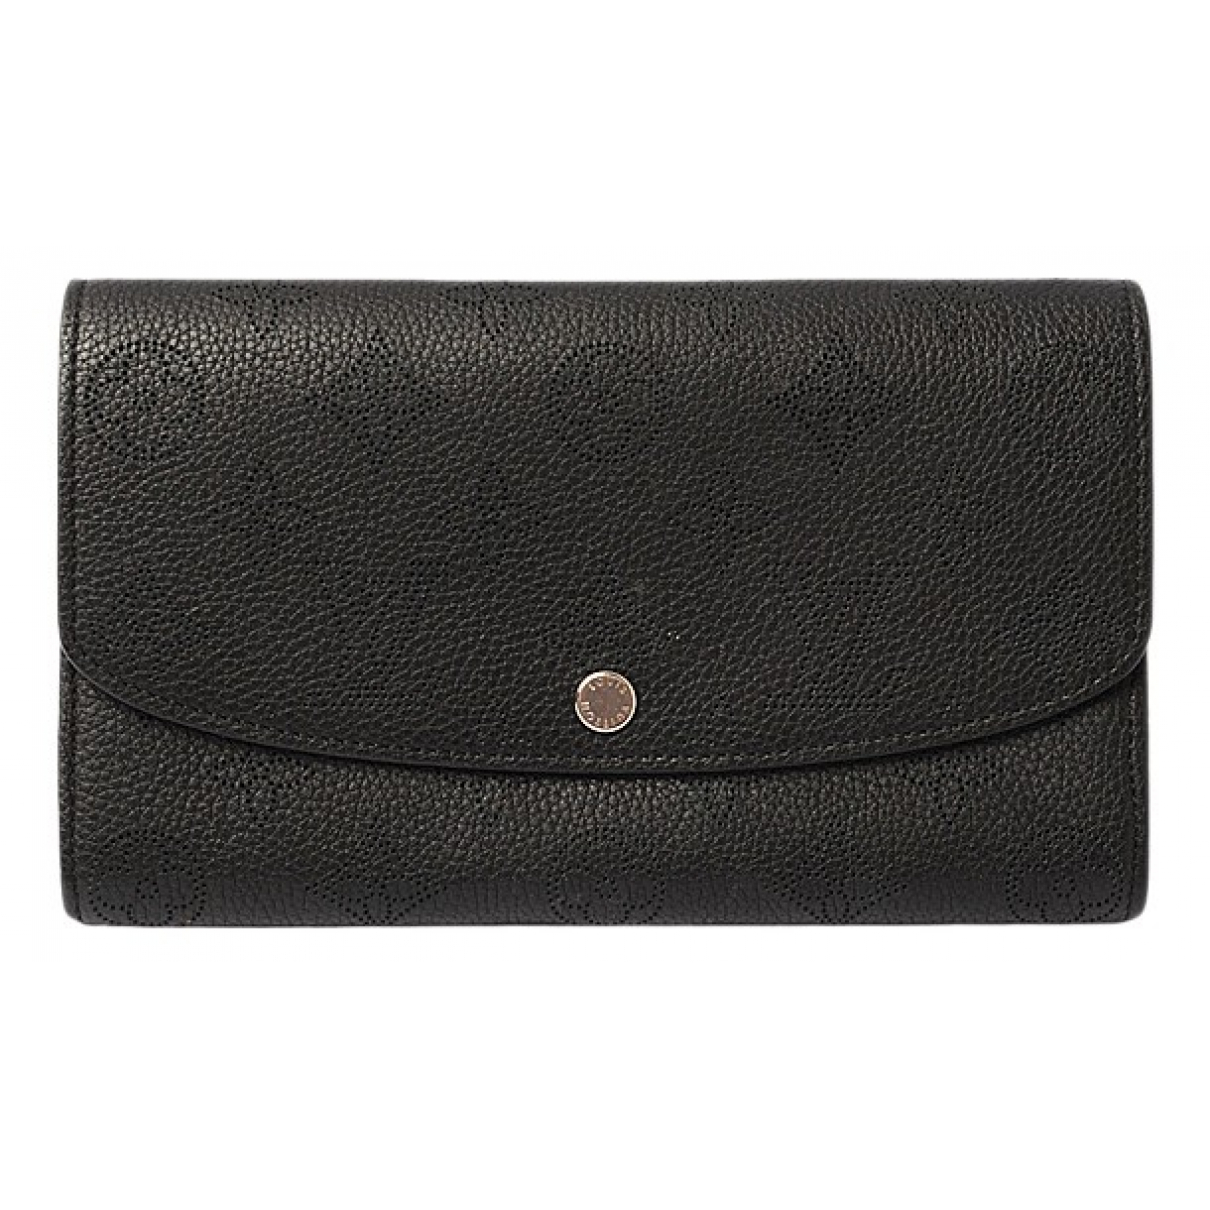 Louis Vuitton Mahina Portemonnaie in  Schwarz Leder